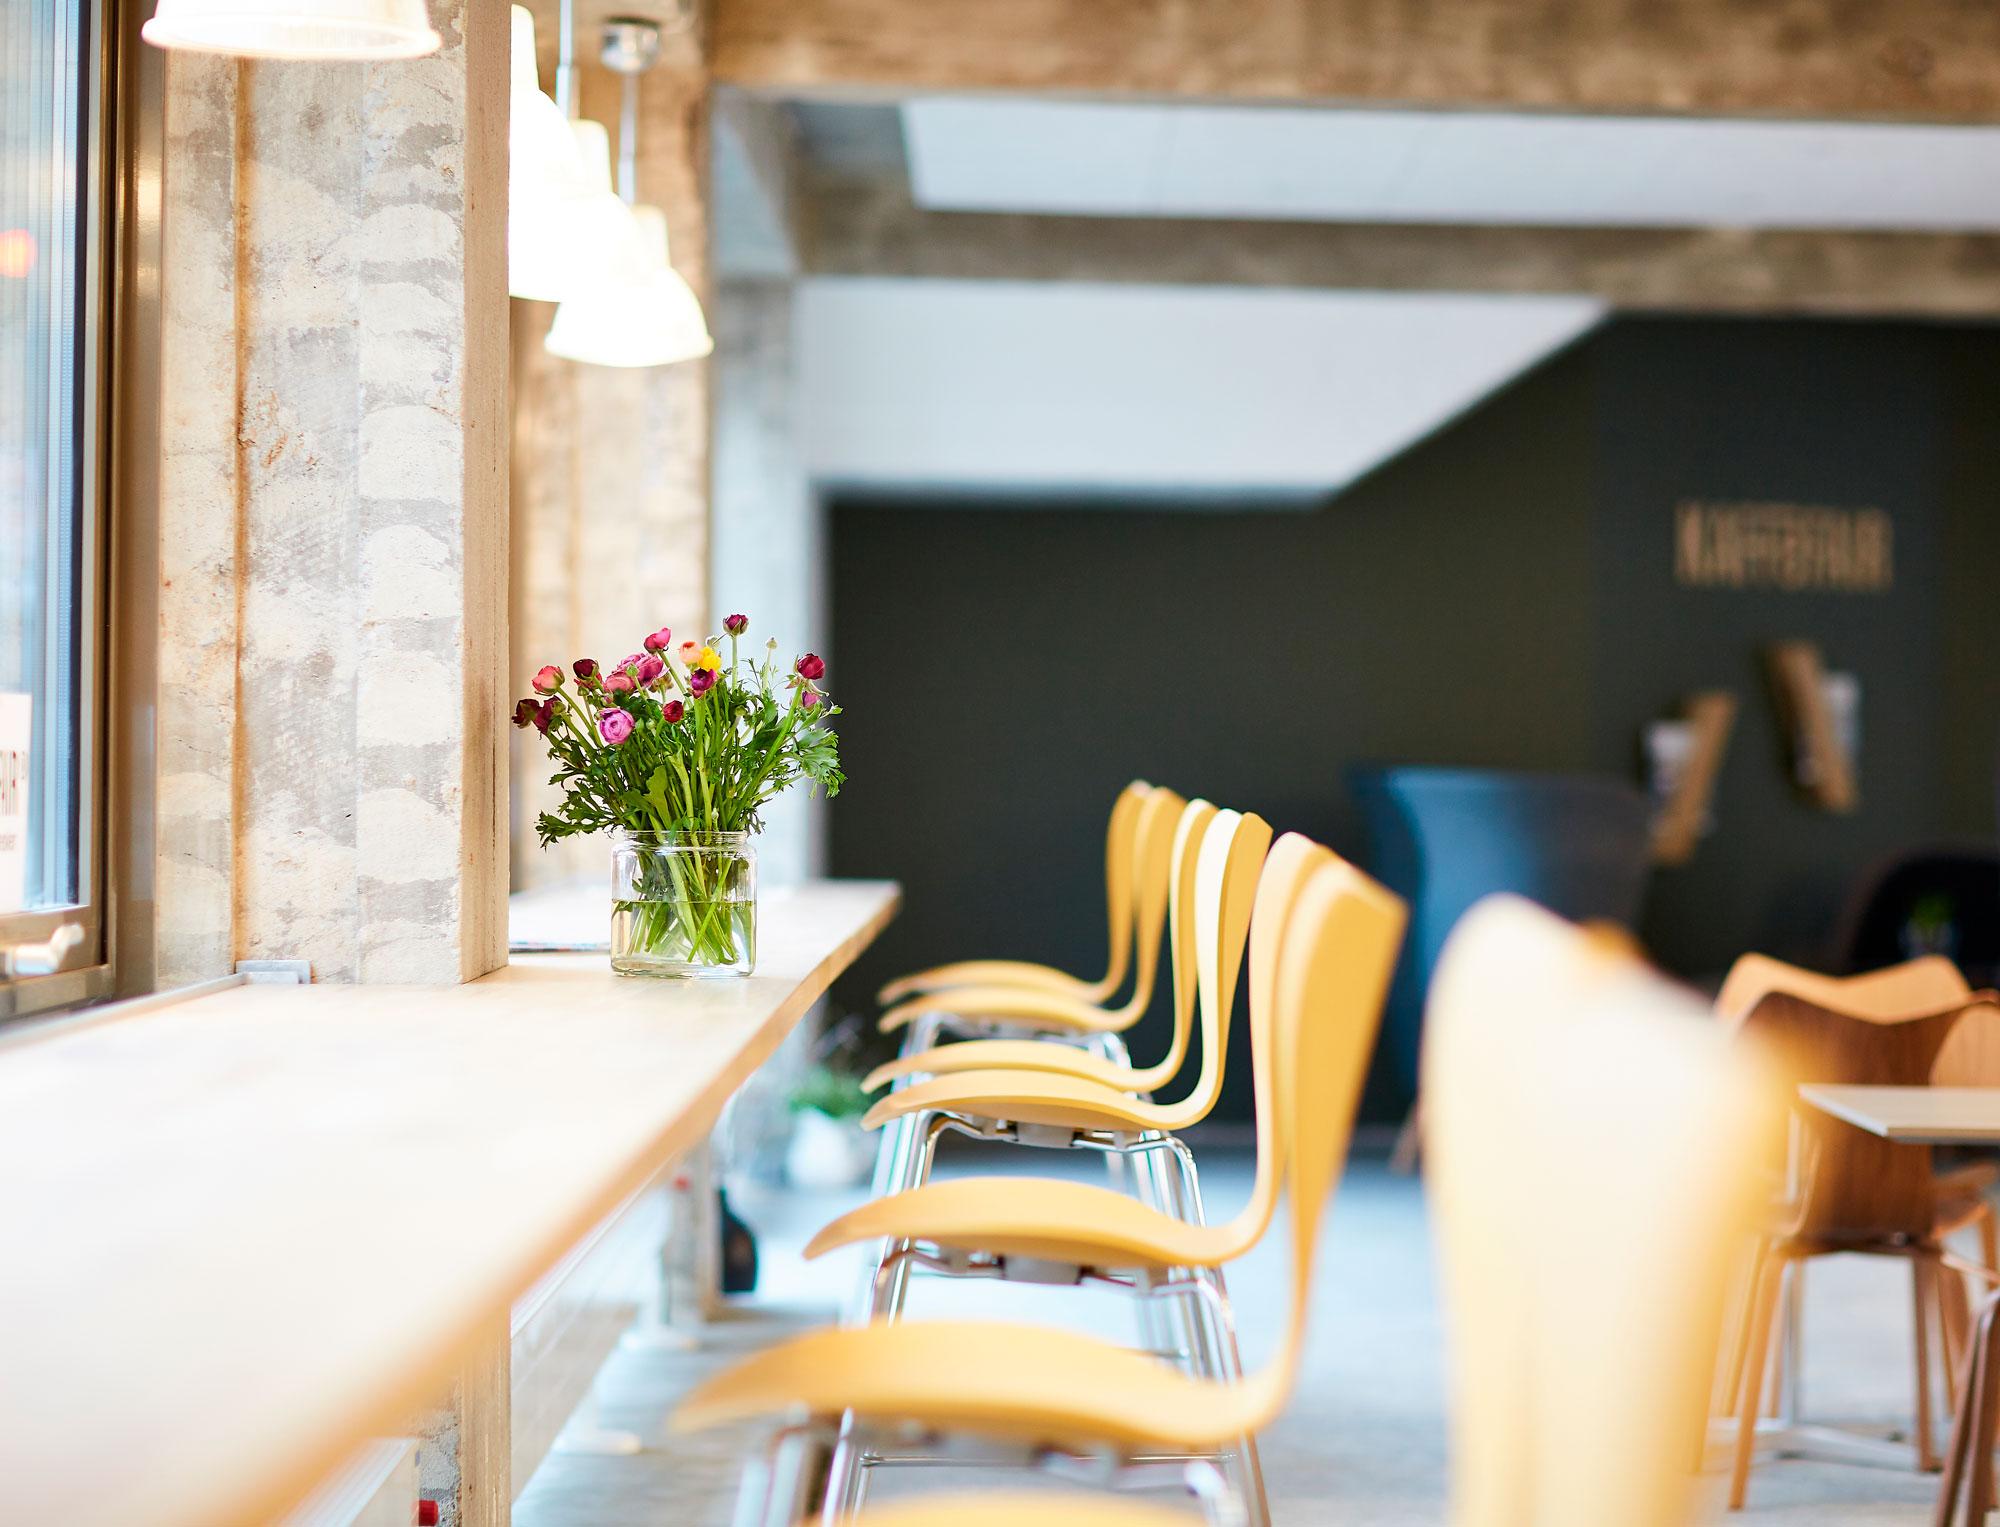 "KaffeFair åbner i nye lækre lokale: Café og Restaurant med ""fair"" priser"